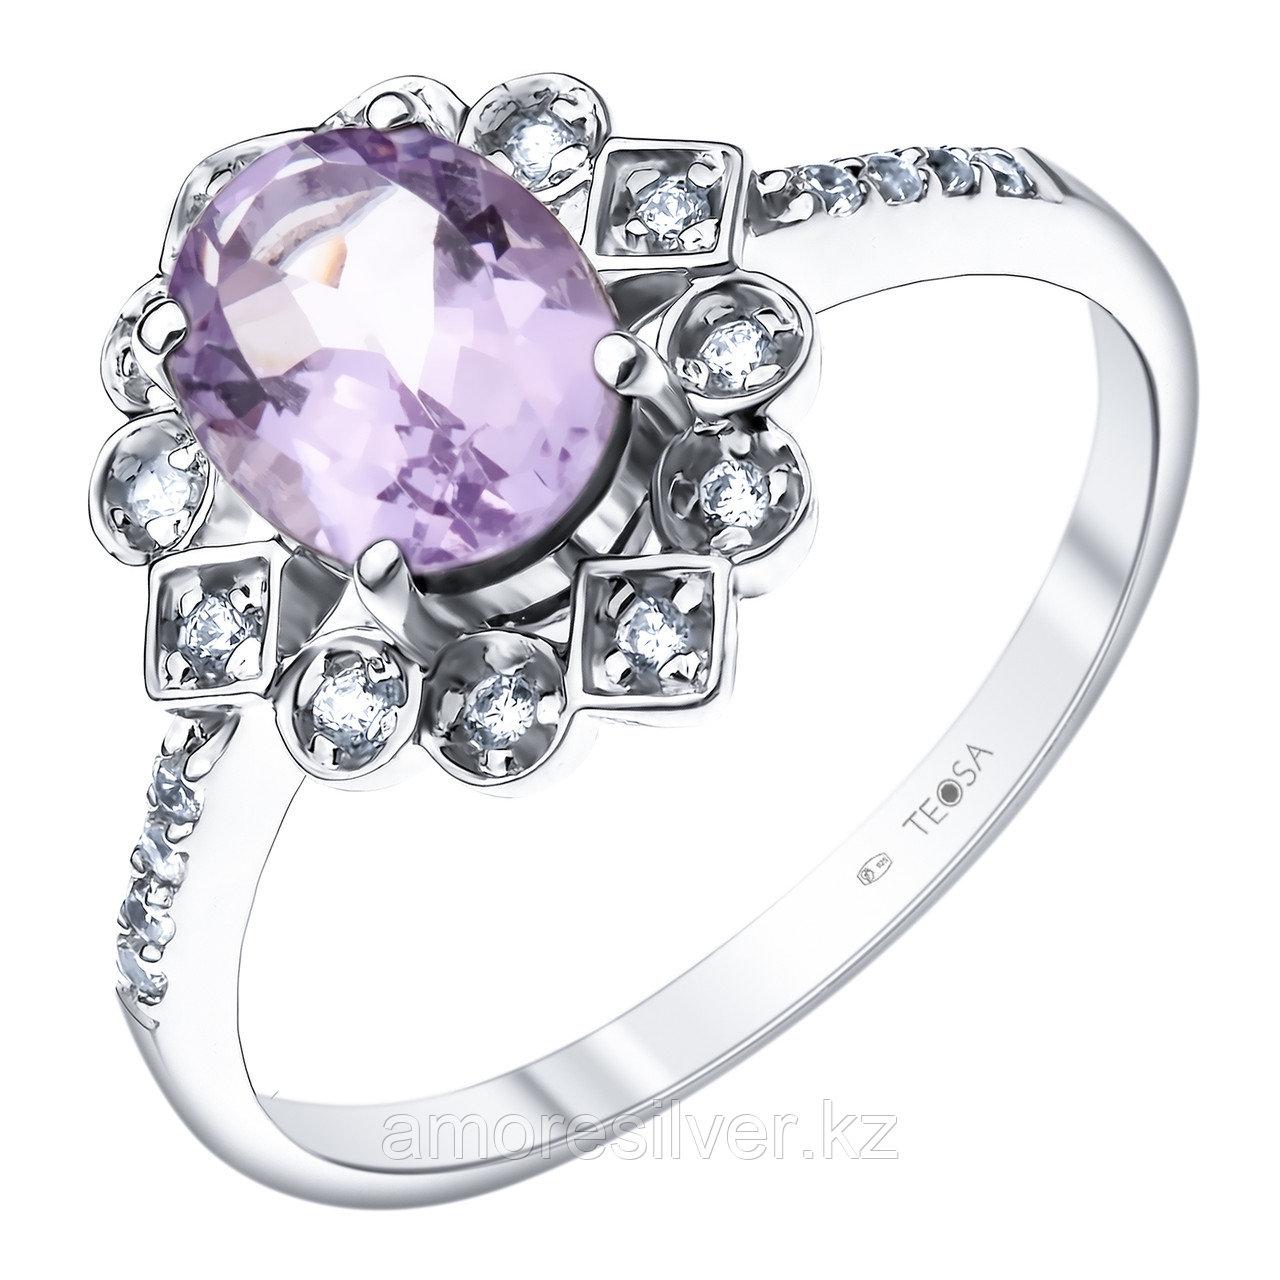 "Кольцо TEOSA серебро с родием, аметист фианит, ""halo"" R-DRGR00792-AM"